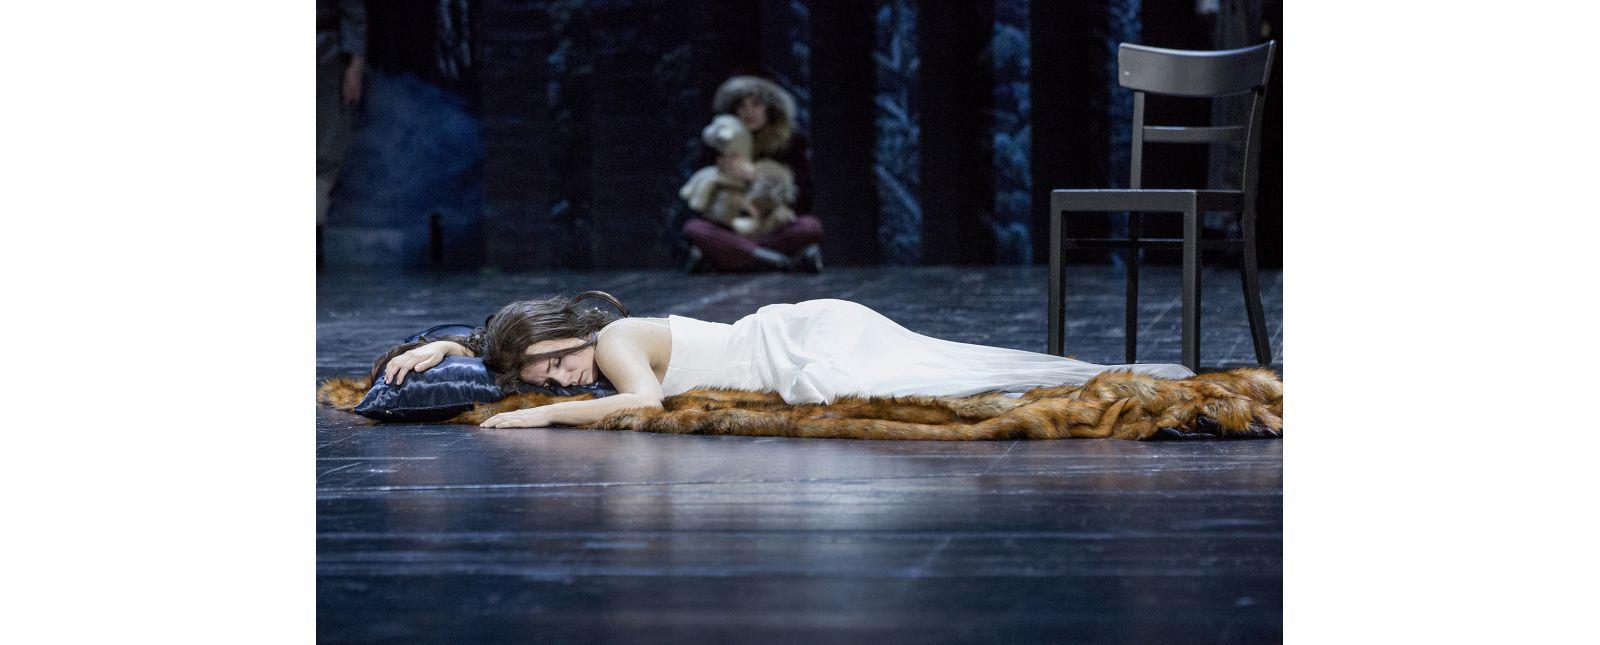 Pelléas et Mélisande // Katharina Ruckgaber // Katharina Bierweiler //  2019 // Foto: Rainer Muranyi